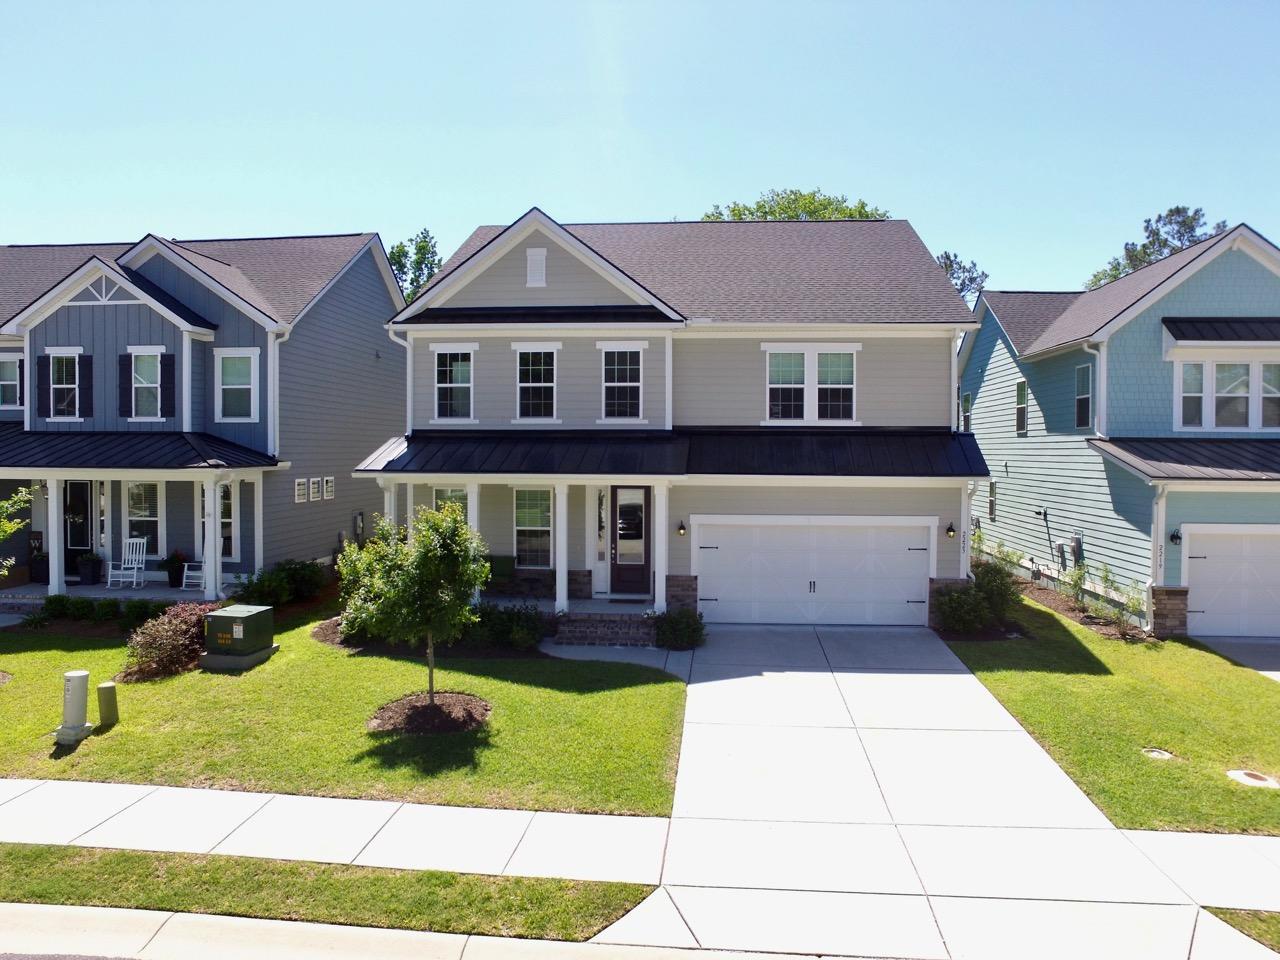 Magnolia Village Homes For Sale - 2223 Spring Hope, Mount Pleasant, SC - 7